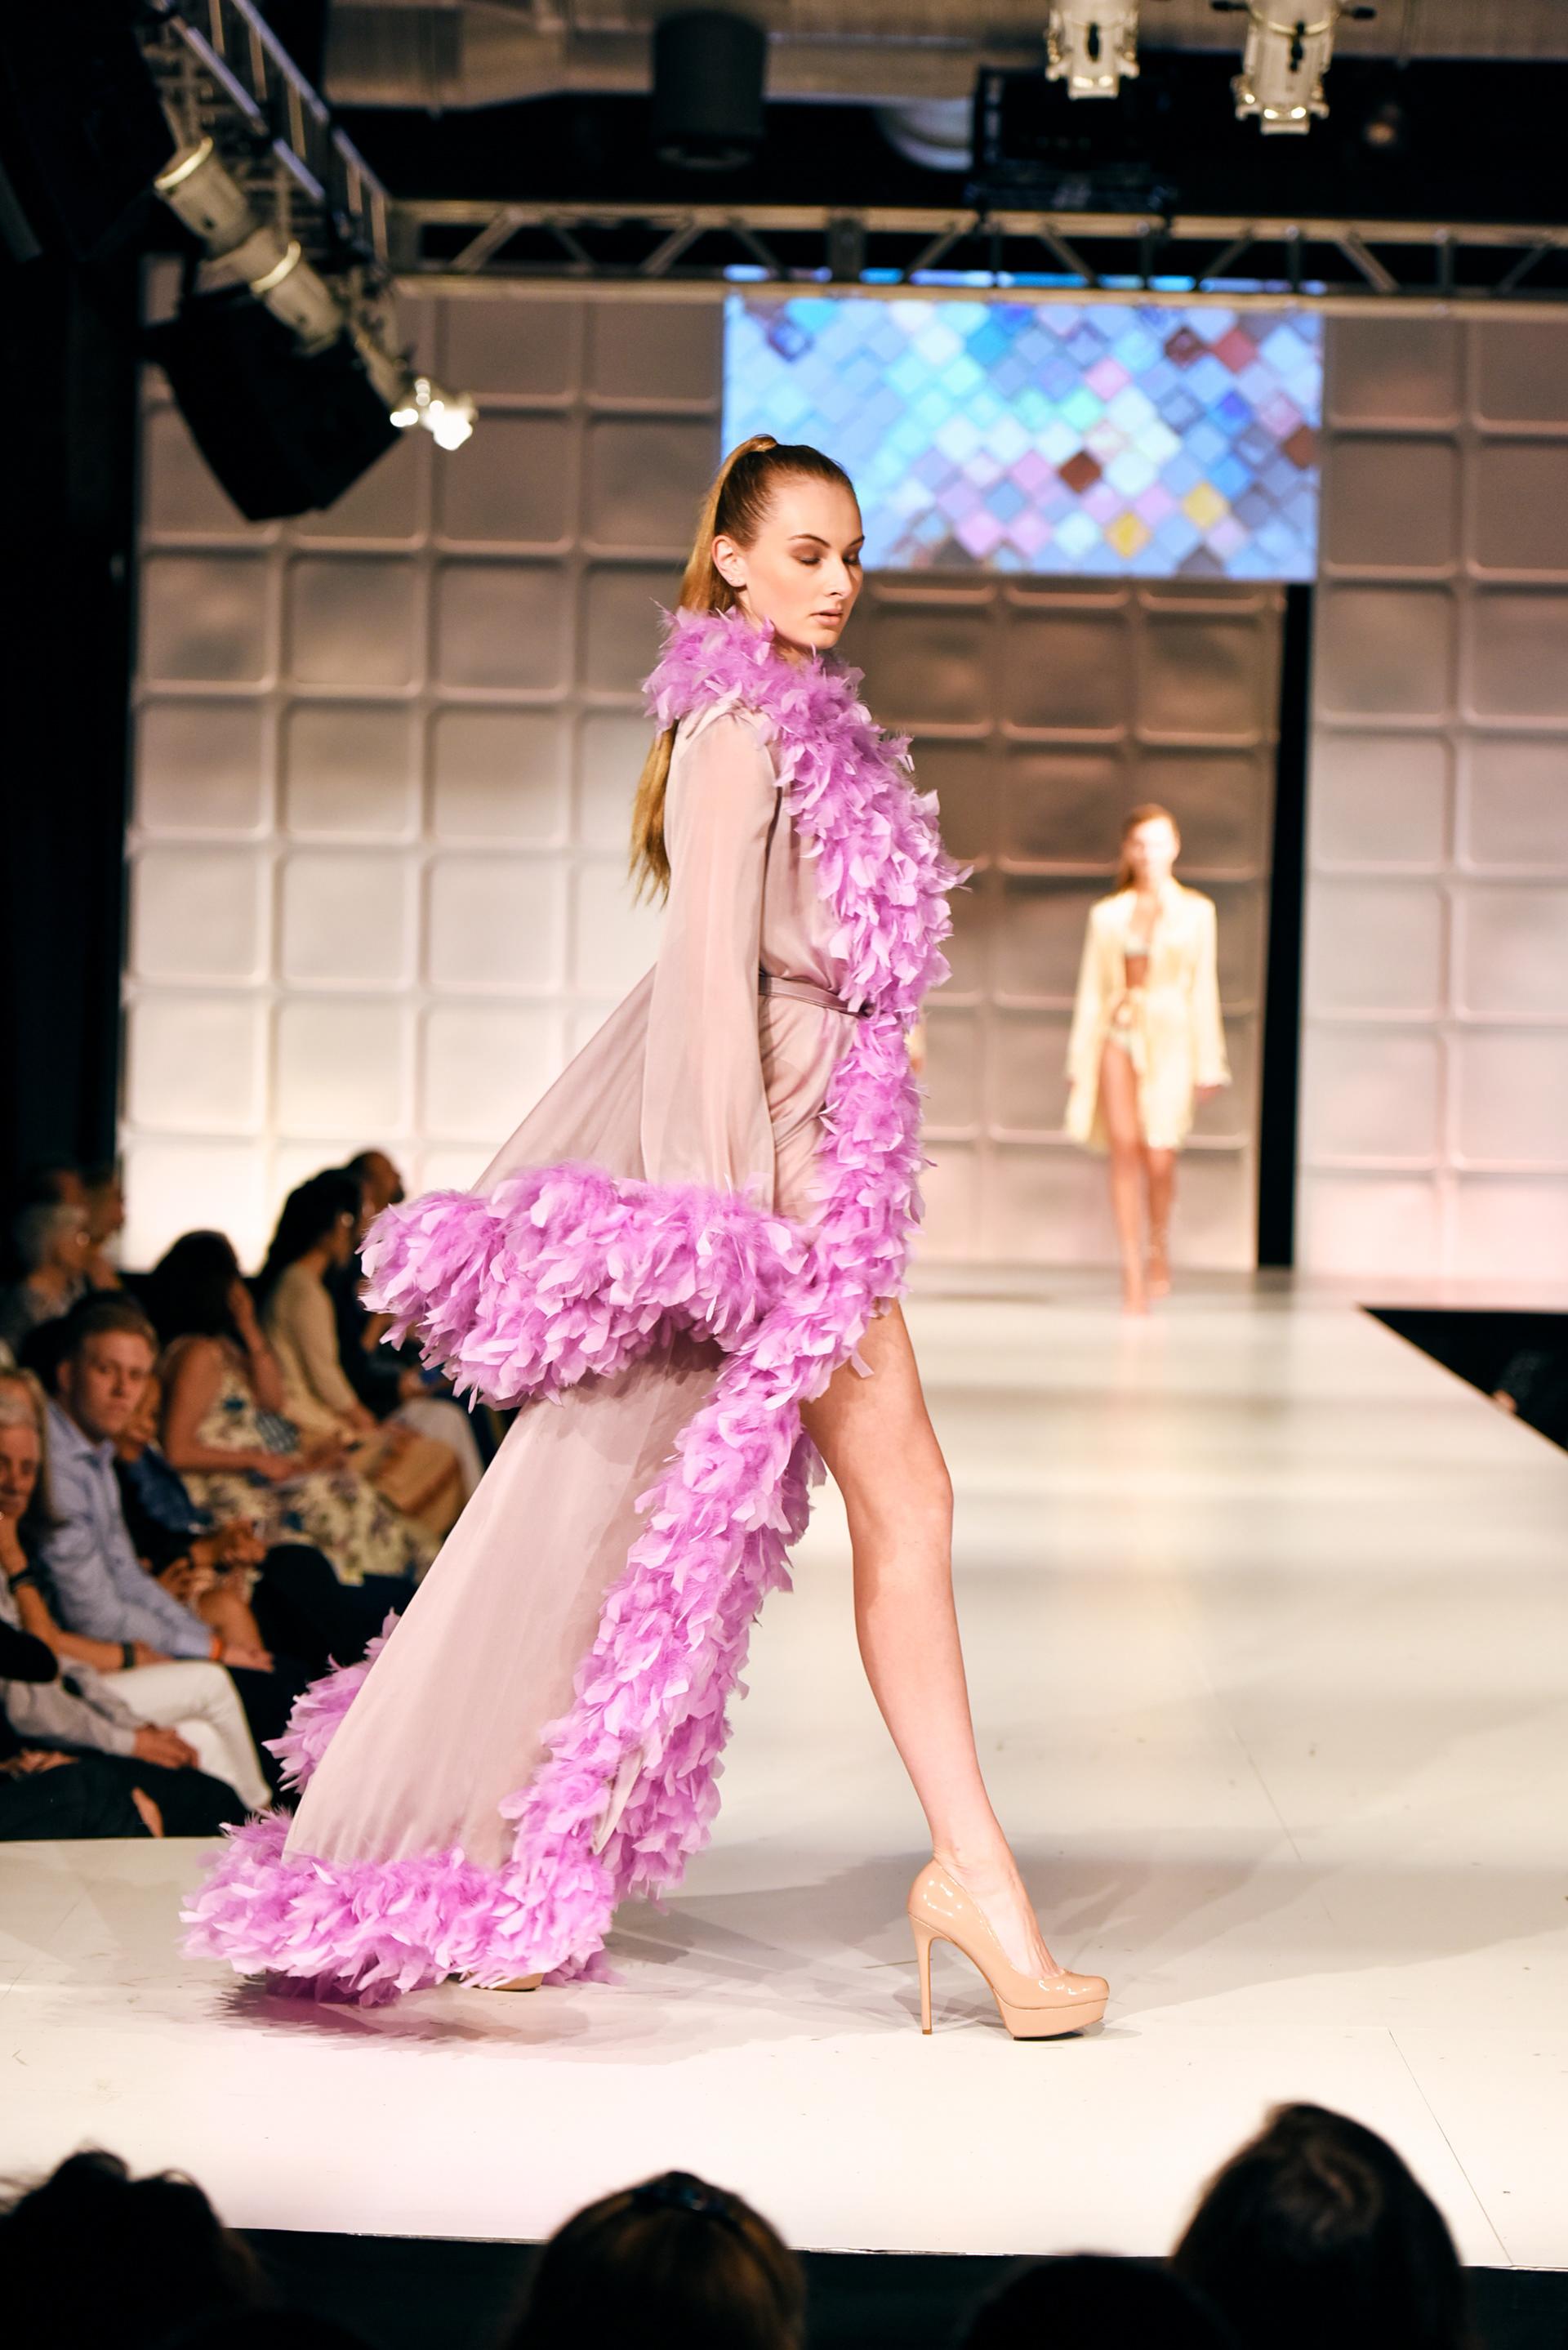 Cory Schneiders Drexel University Fashion Show 2018